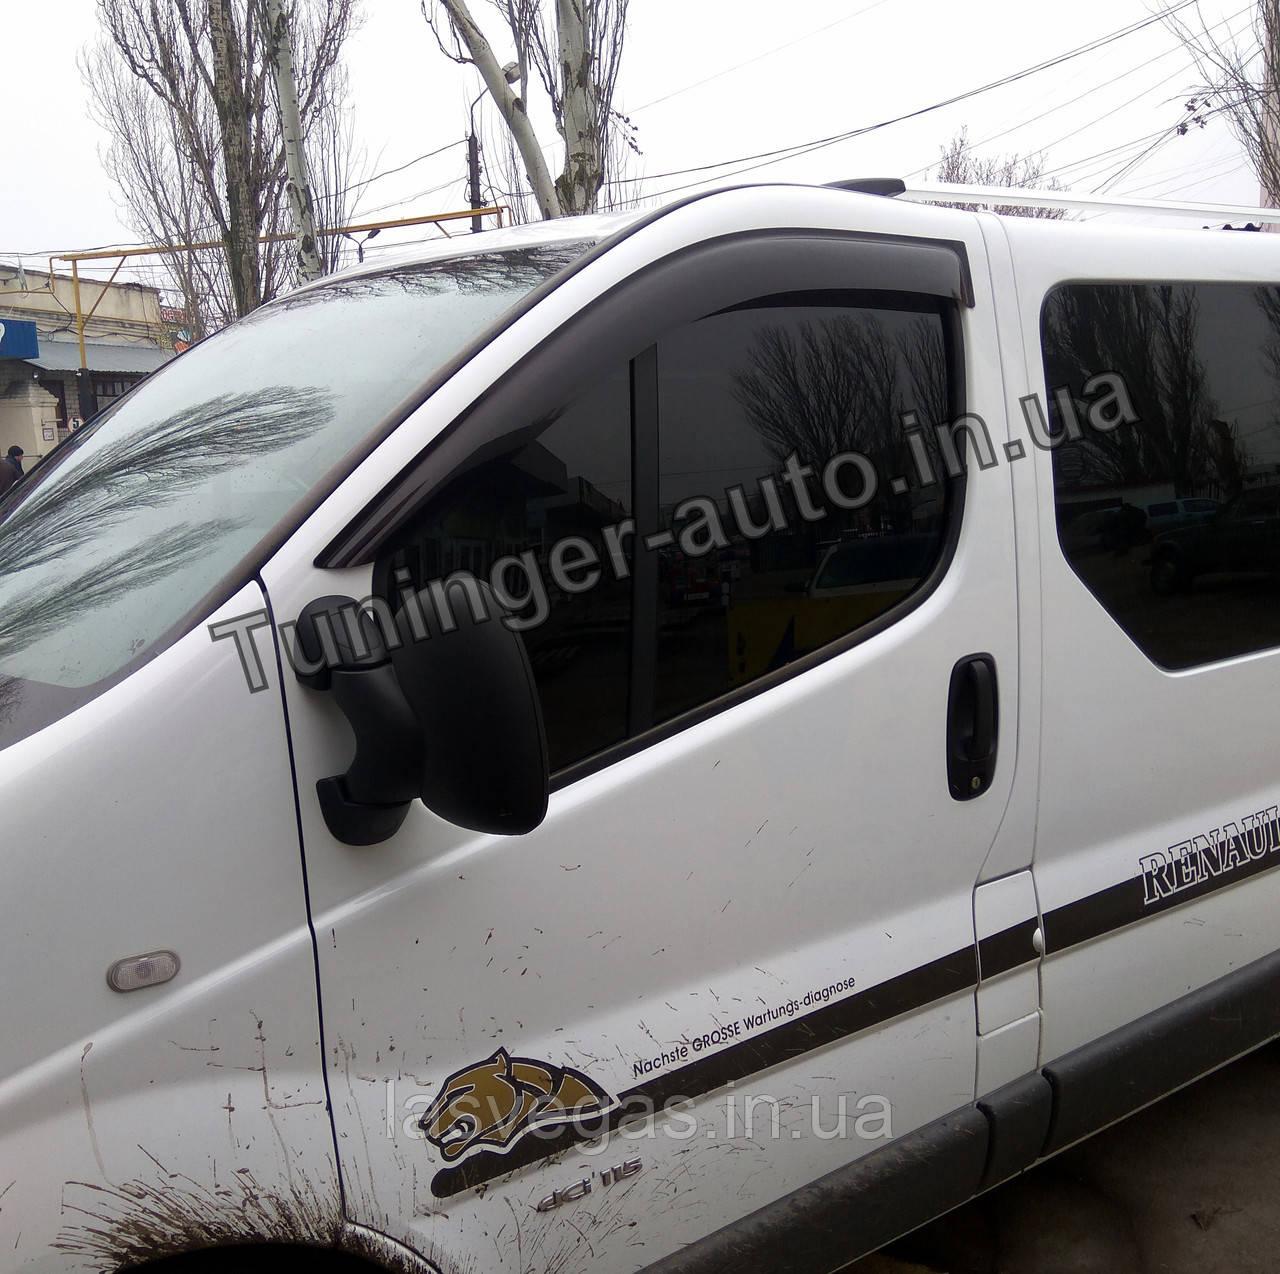 Ветровики, дефлекторы окон Renault Trafic/Opel Vivaro 2001-2014 (Anv)